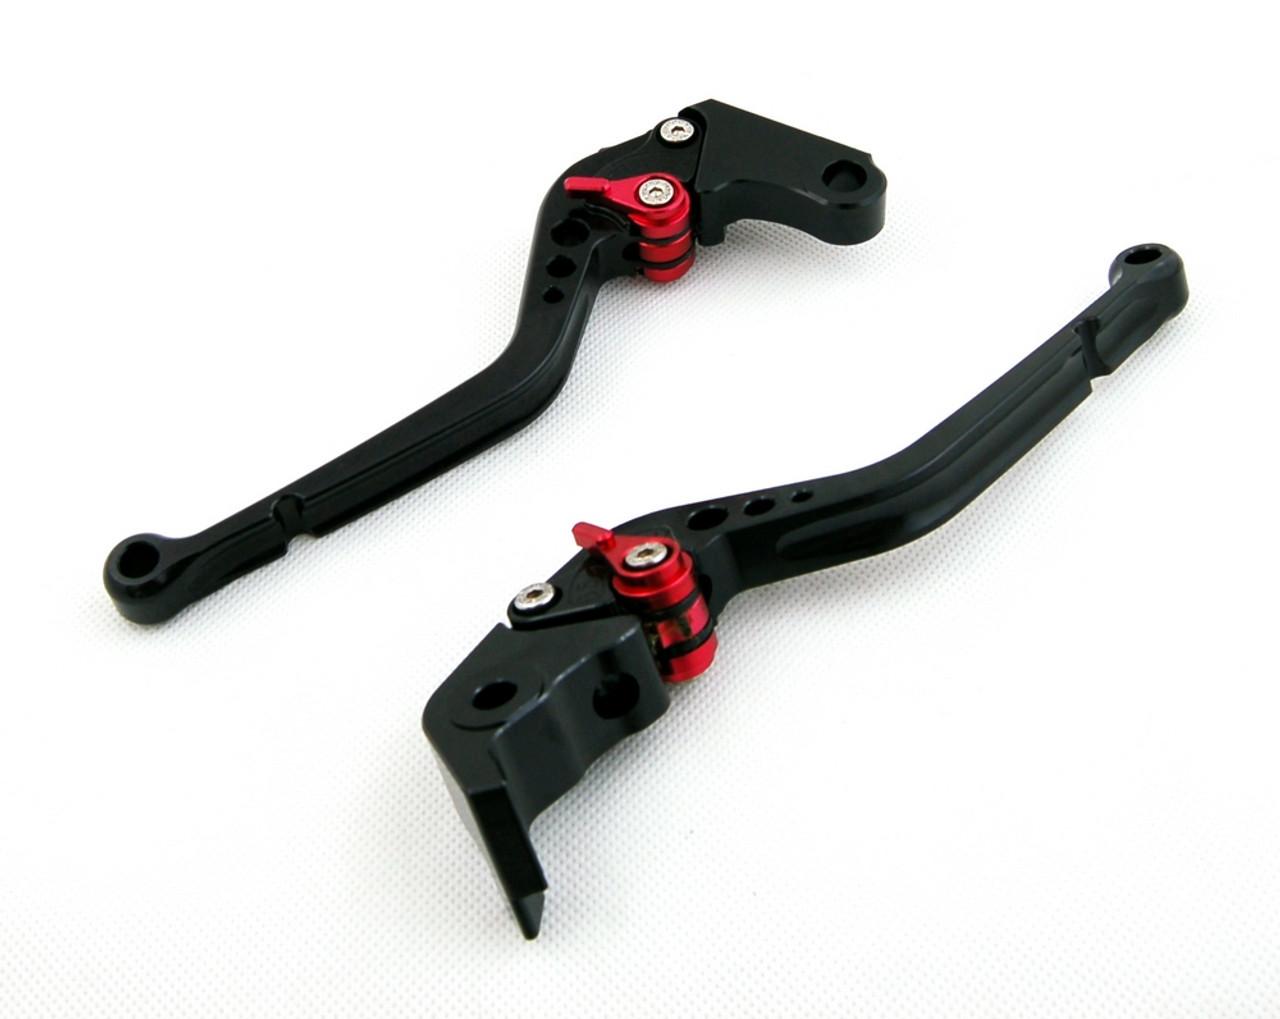 Long Brake Clutch Levers For Suzuki GSXR1000 09-14 GSXR600 GSXR750 11-14 Black